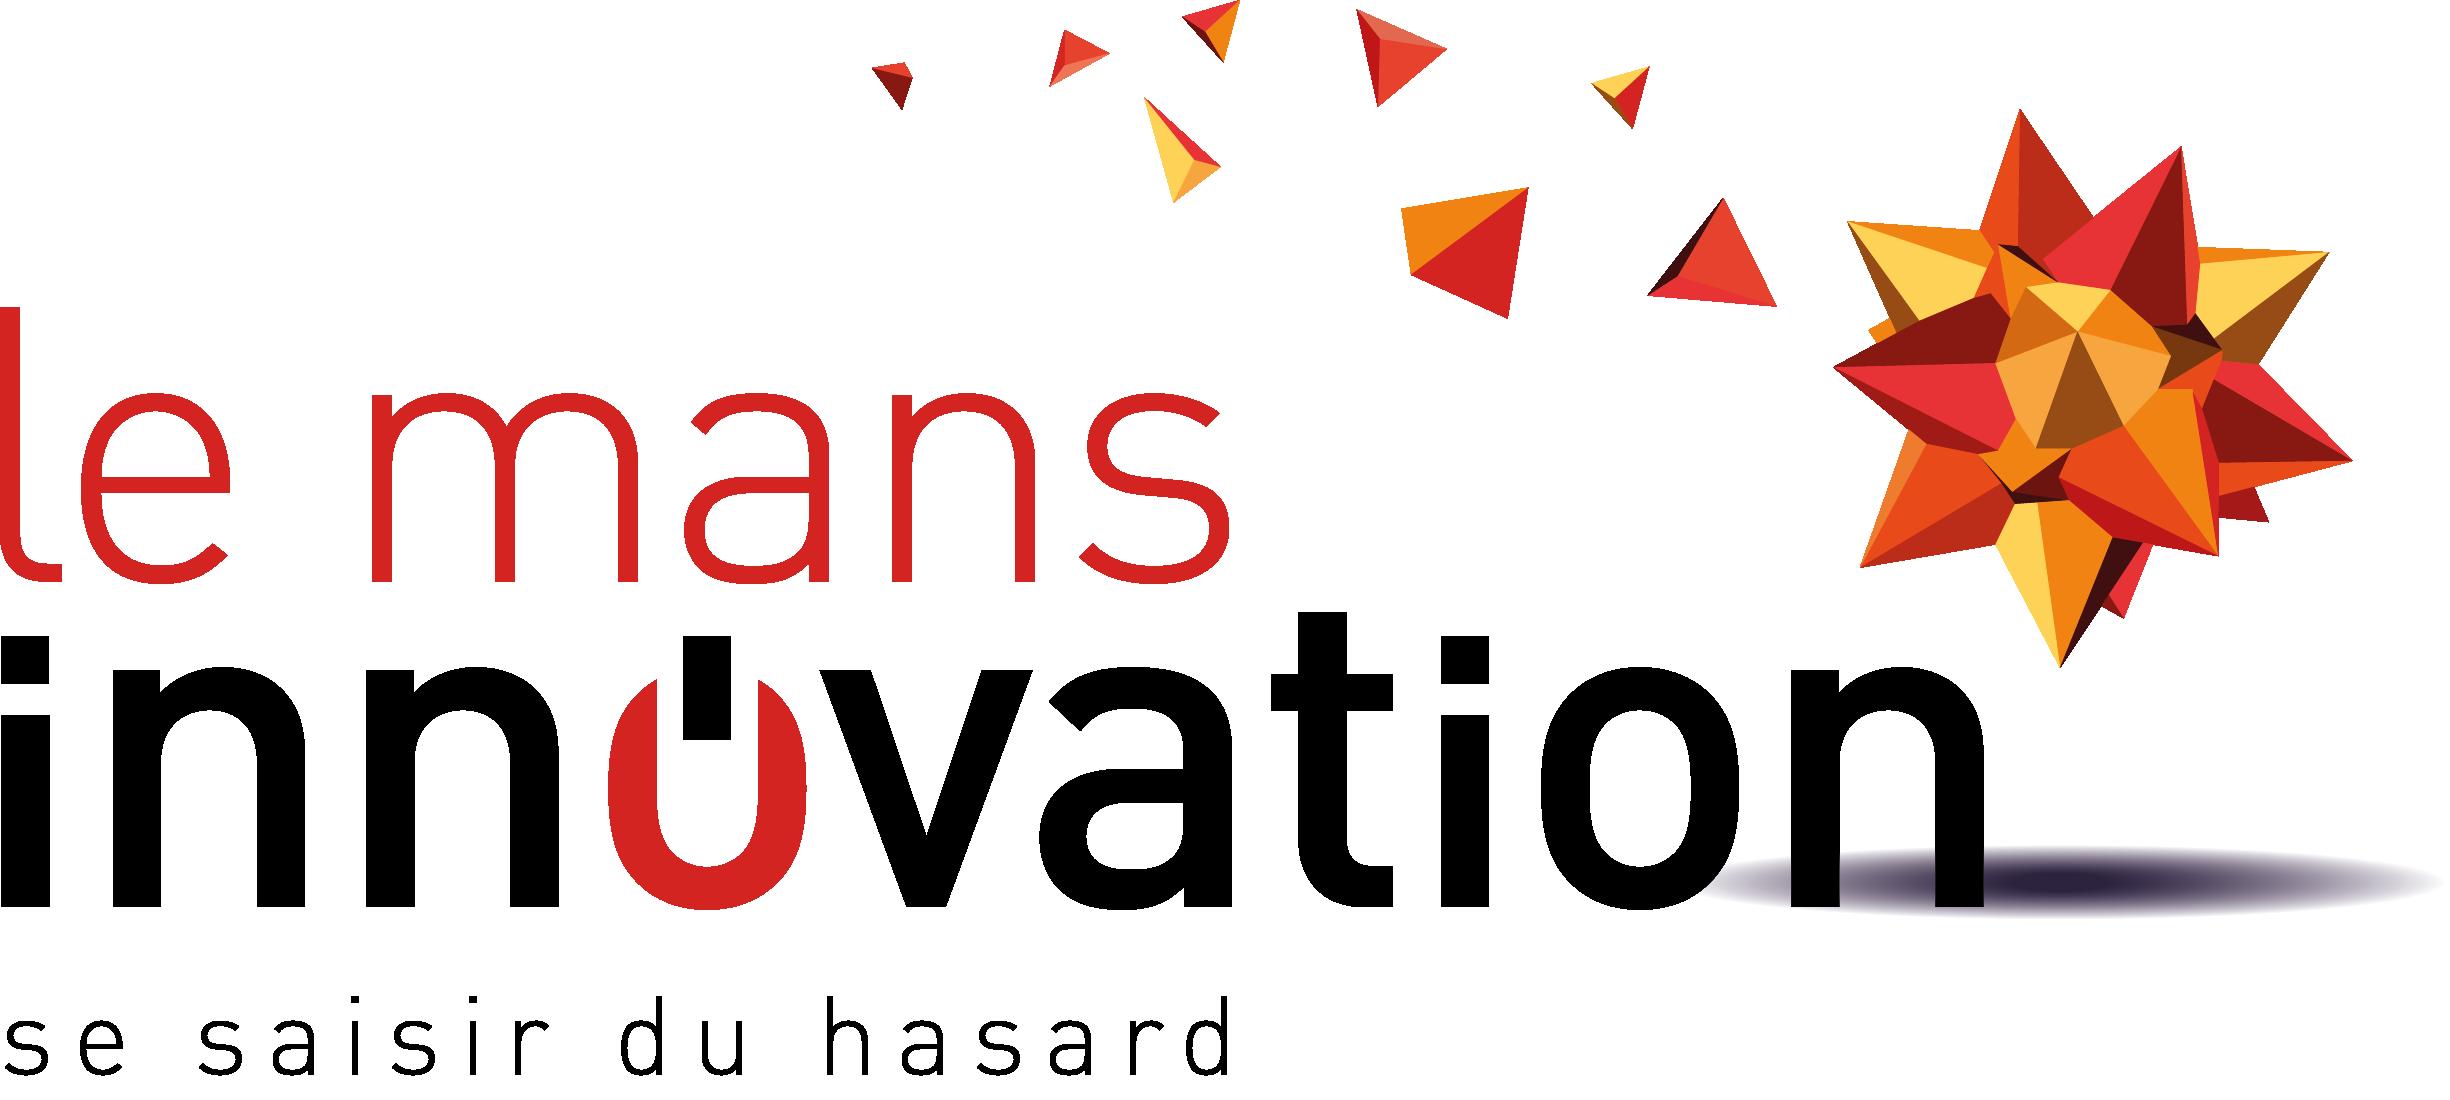 Logotype de Le Mans innovation